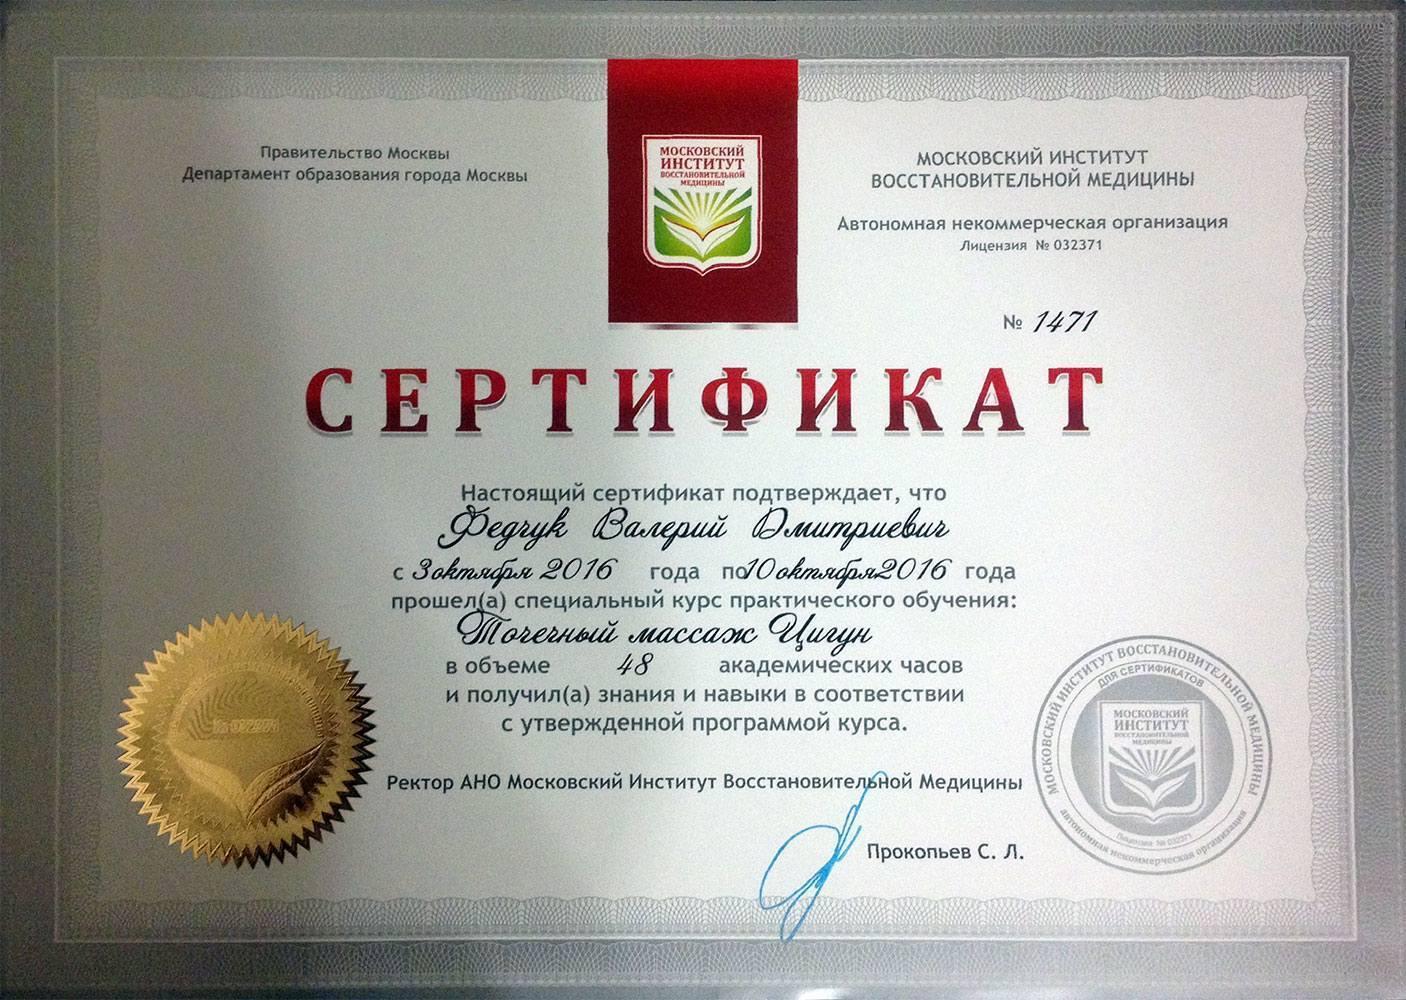 7-tsigun-sertifikat